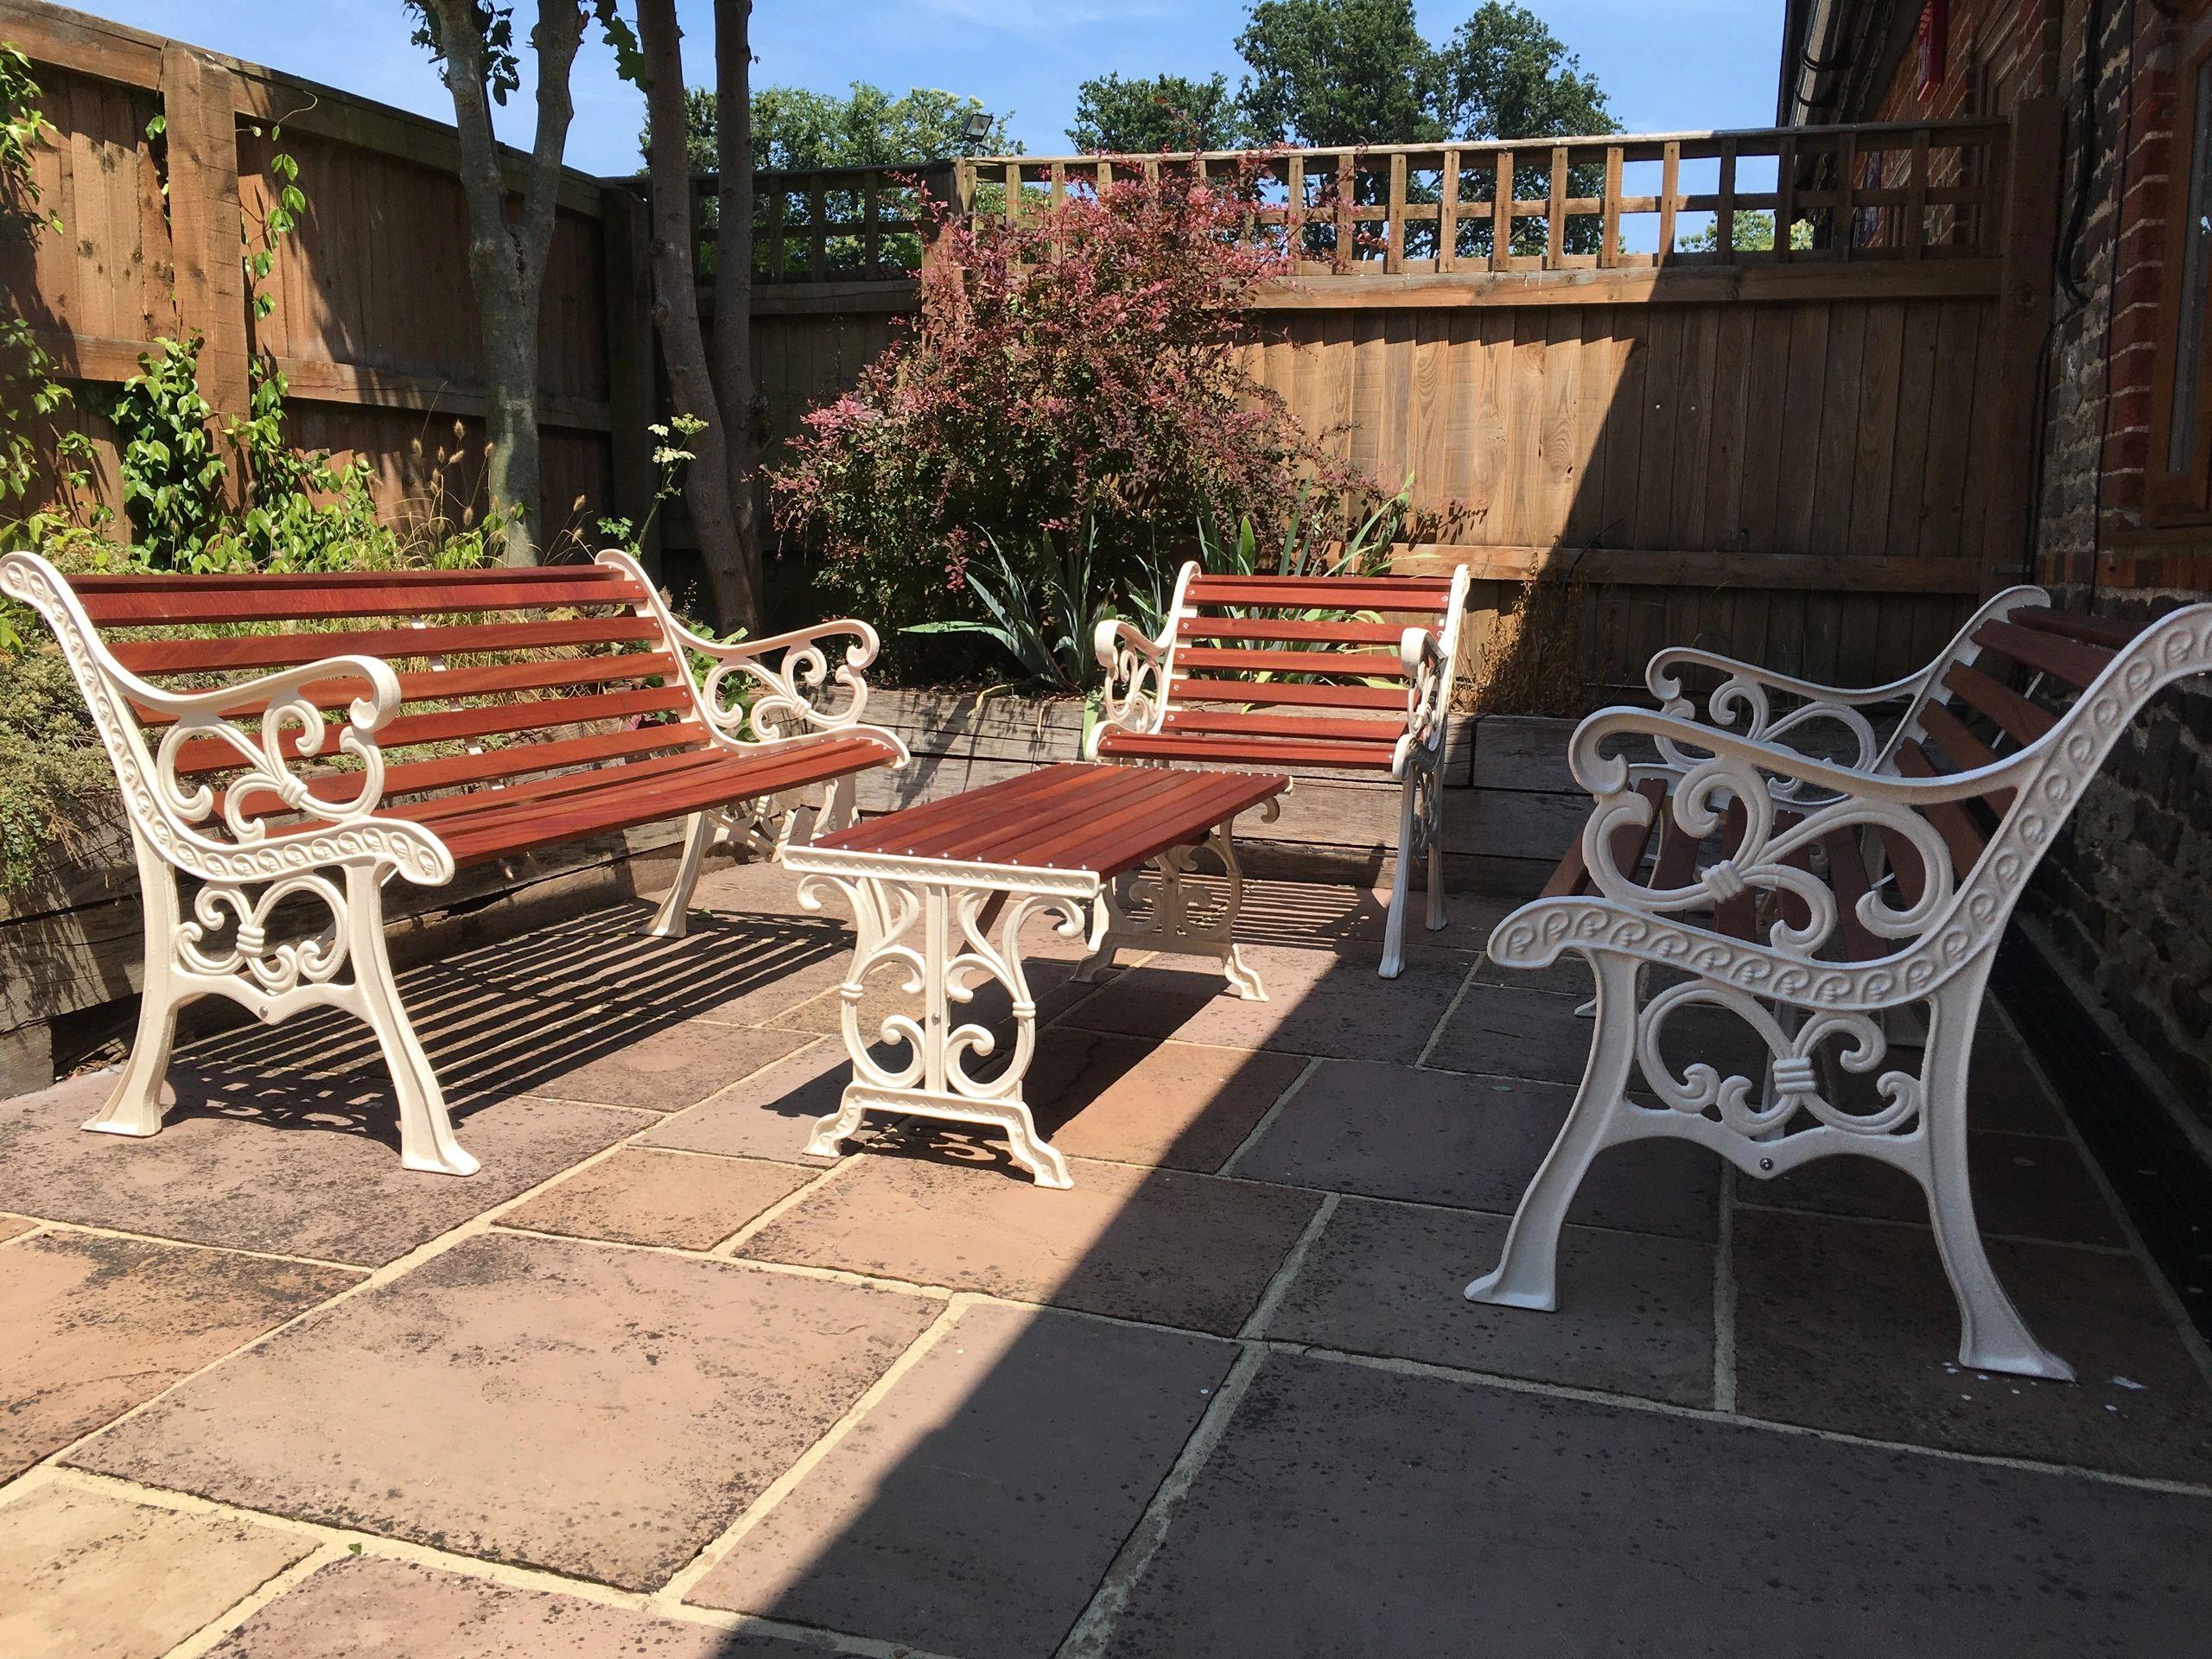 Sensational Reclaimed Garden Furniture Benches Patio Furniture Short Links Chair Design For Home Short Linksinfo